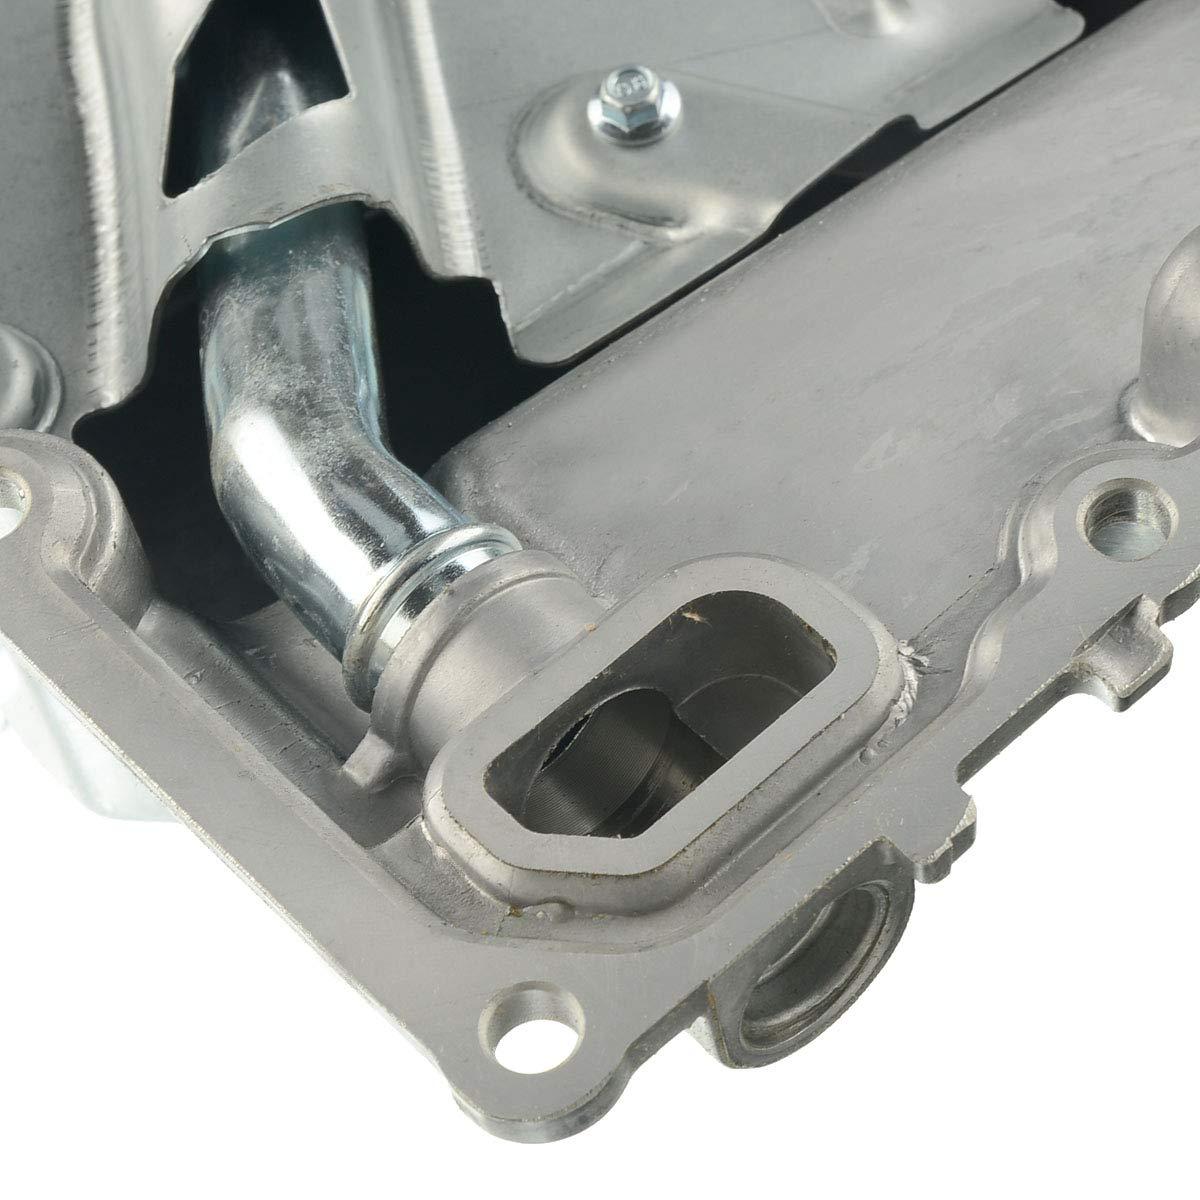 Engine Oil Pan For Chevrolet Malibu 2005 2014 Hhr Cobalt Saturn Vue Transmission Pontiac G5 G6 Ion Buick Regal Automotive